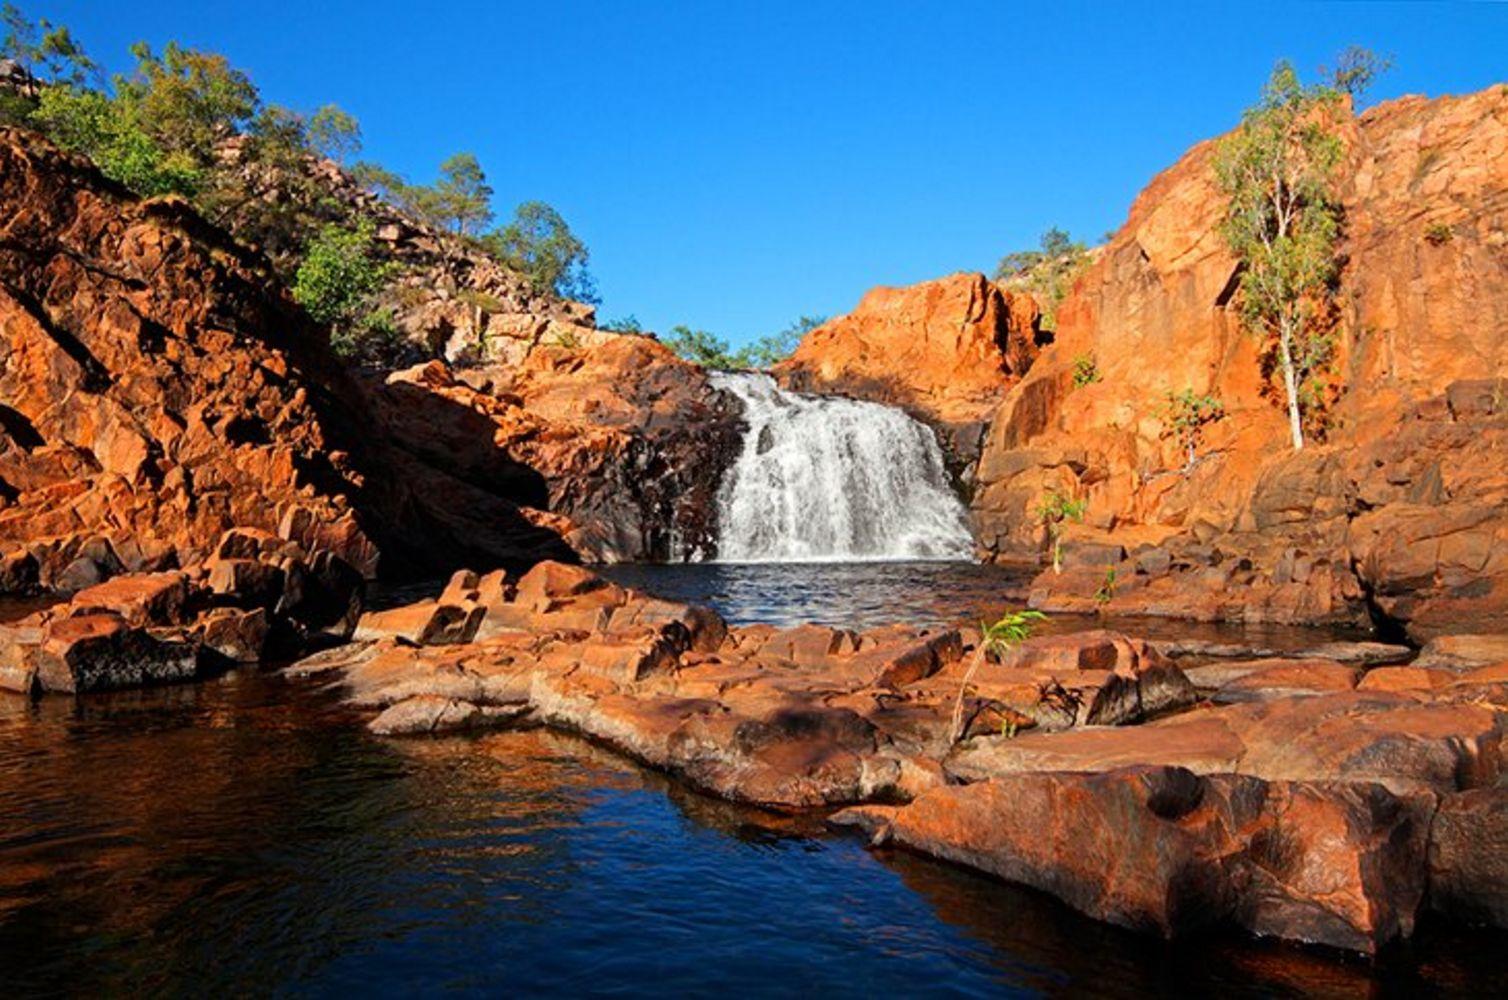 Kakadu National Park, Australia - 2023 solar eclipse tour